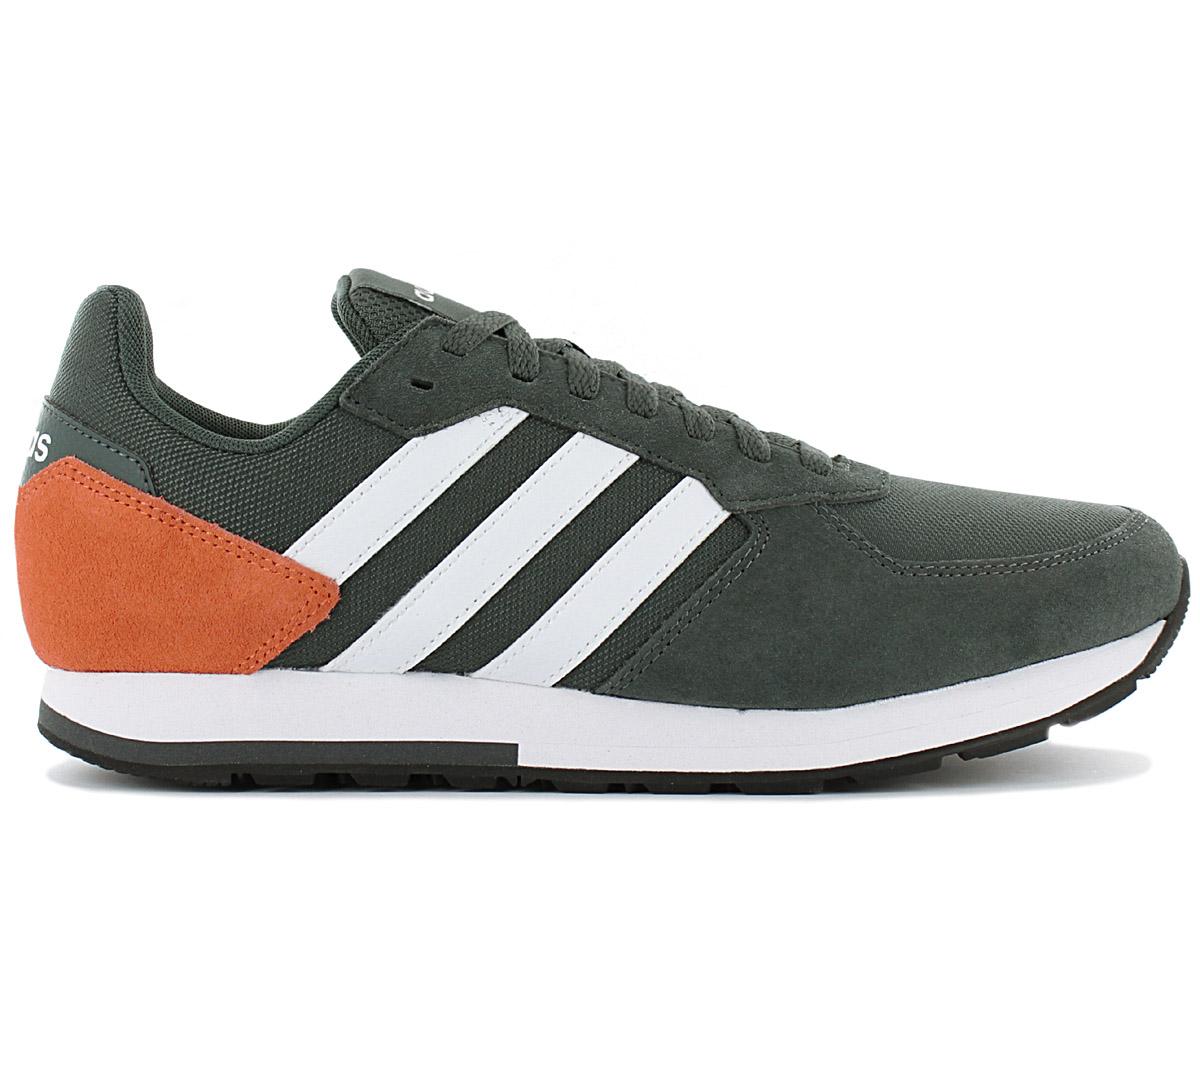 heiß Details zu adidas 8K Racer Herren Sneaker Schuhe F34482 Grün Turnschuhe Sportschuhe NEU  Kostenloser Versand